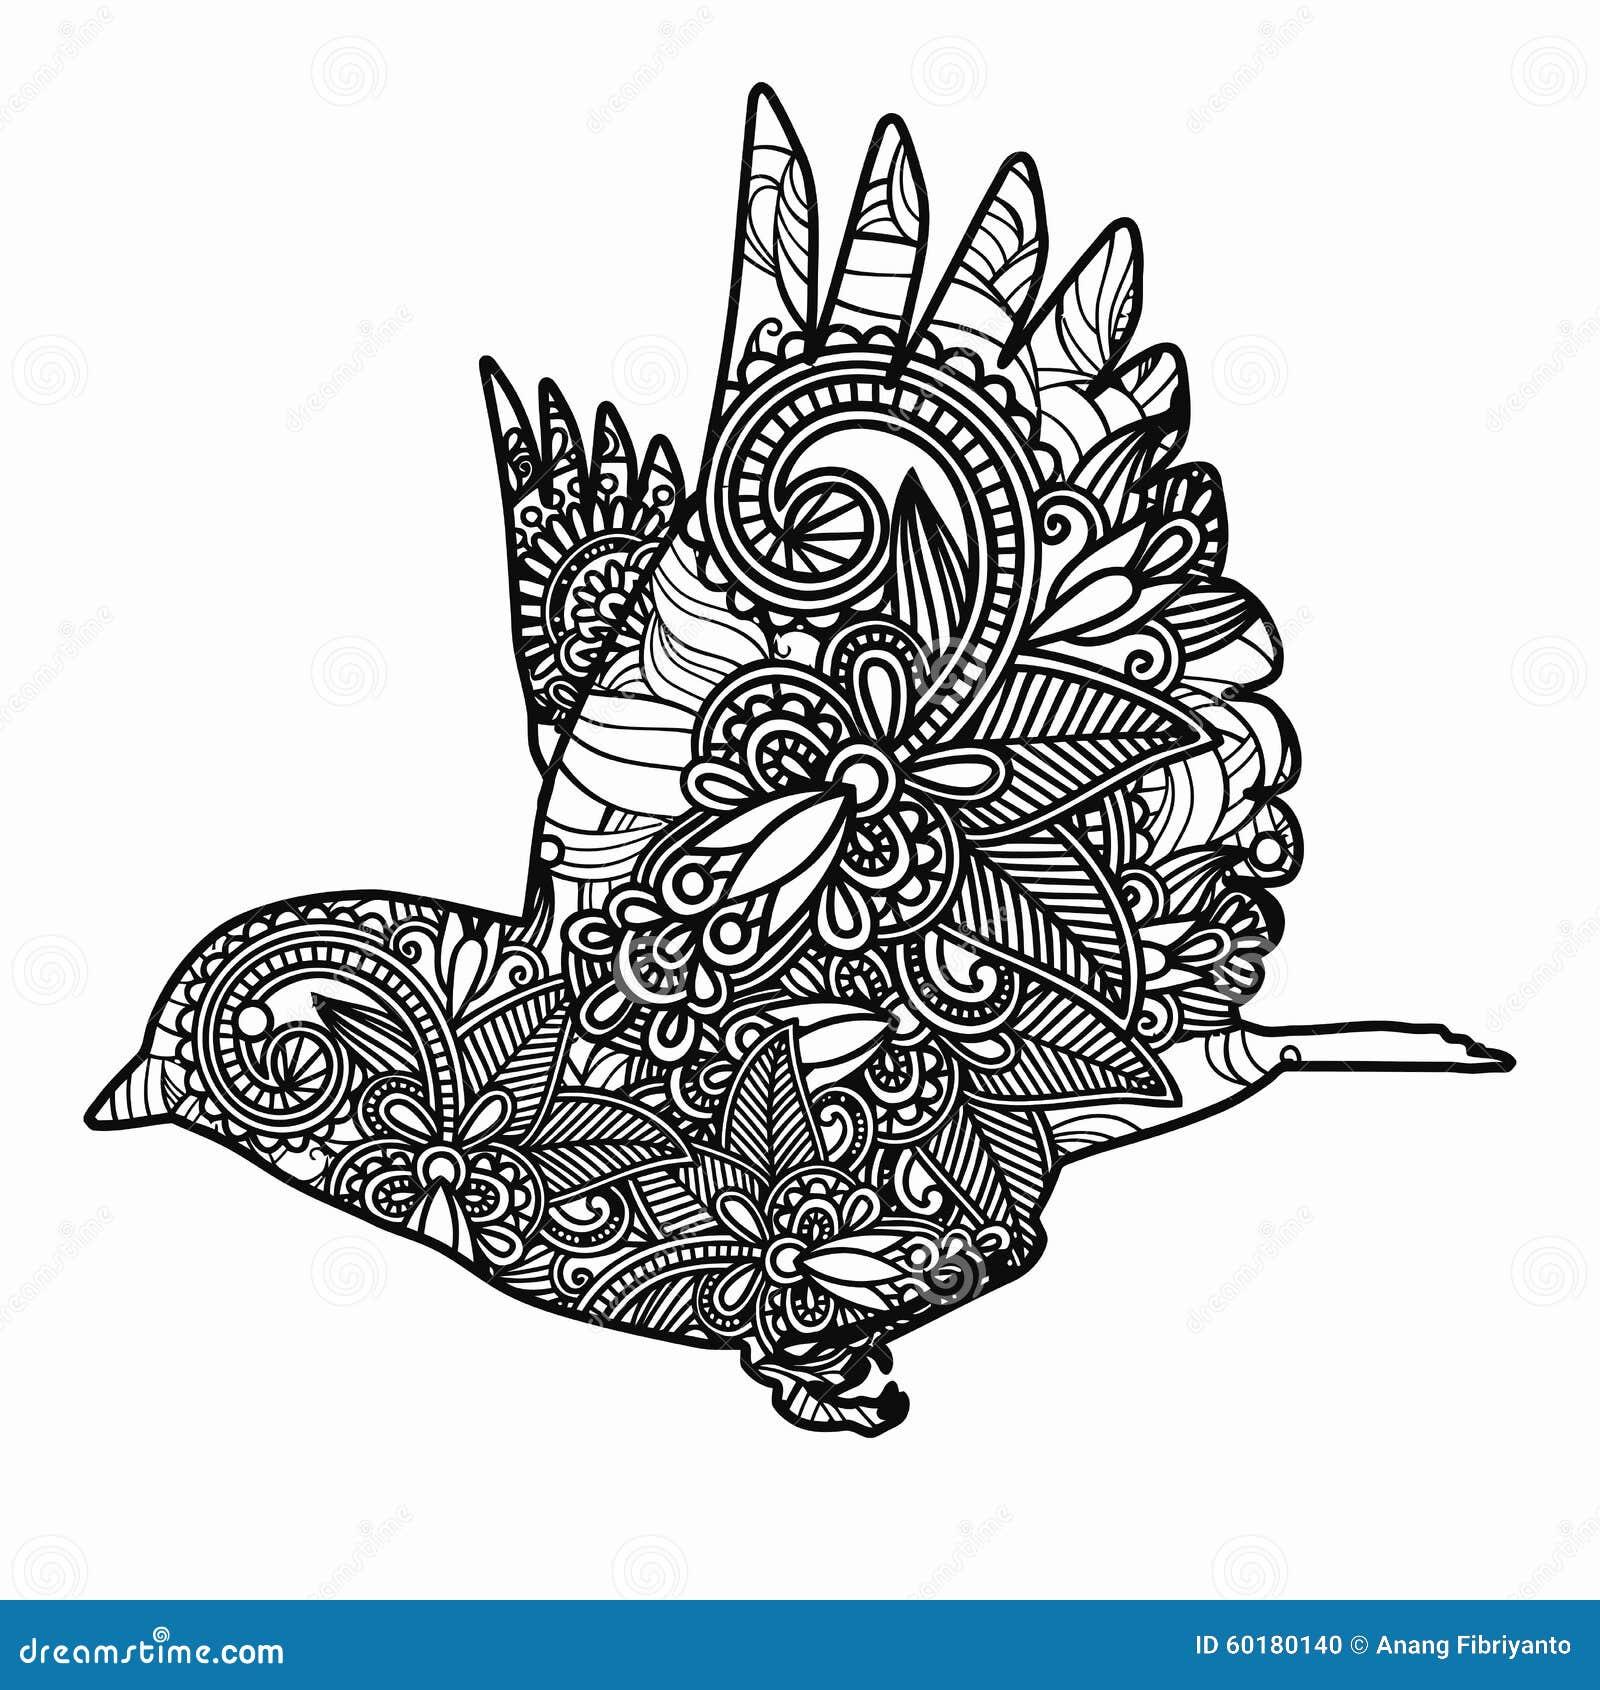 Zentangle Stylized Bird Illustration Hand Drawn Doodle Isolated On White